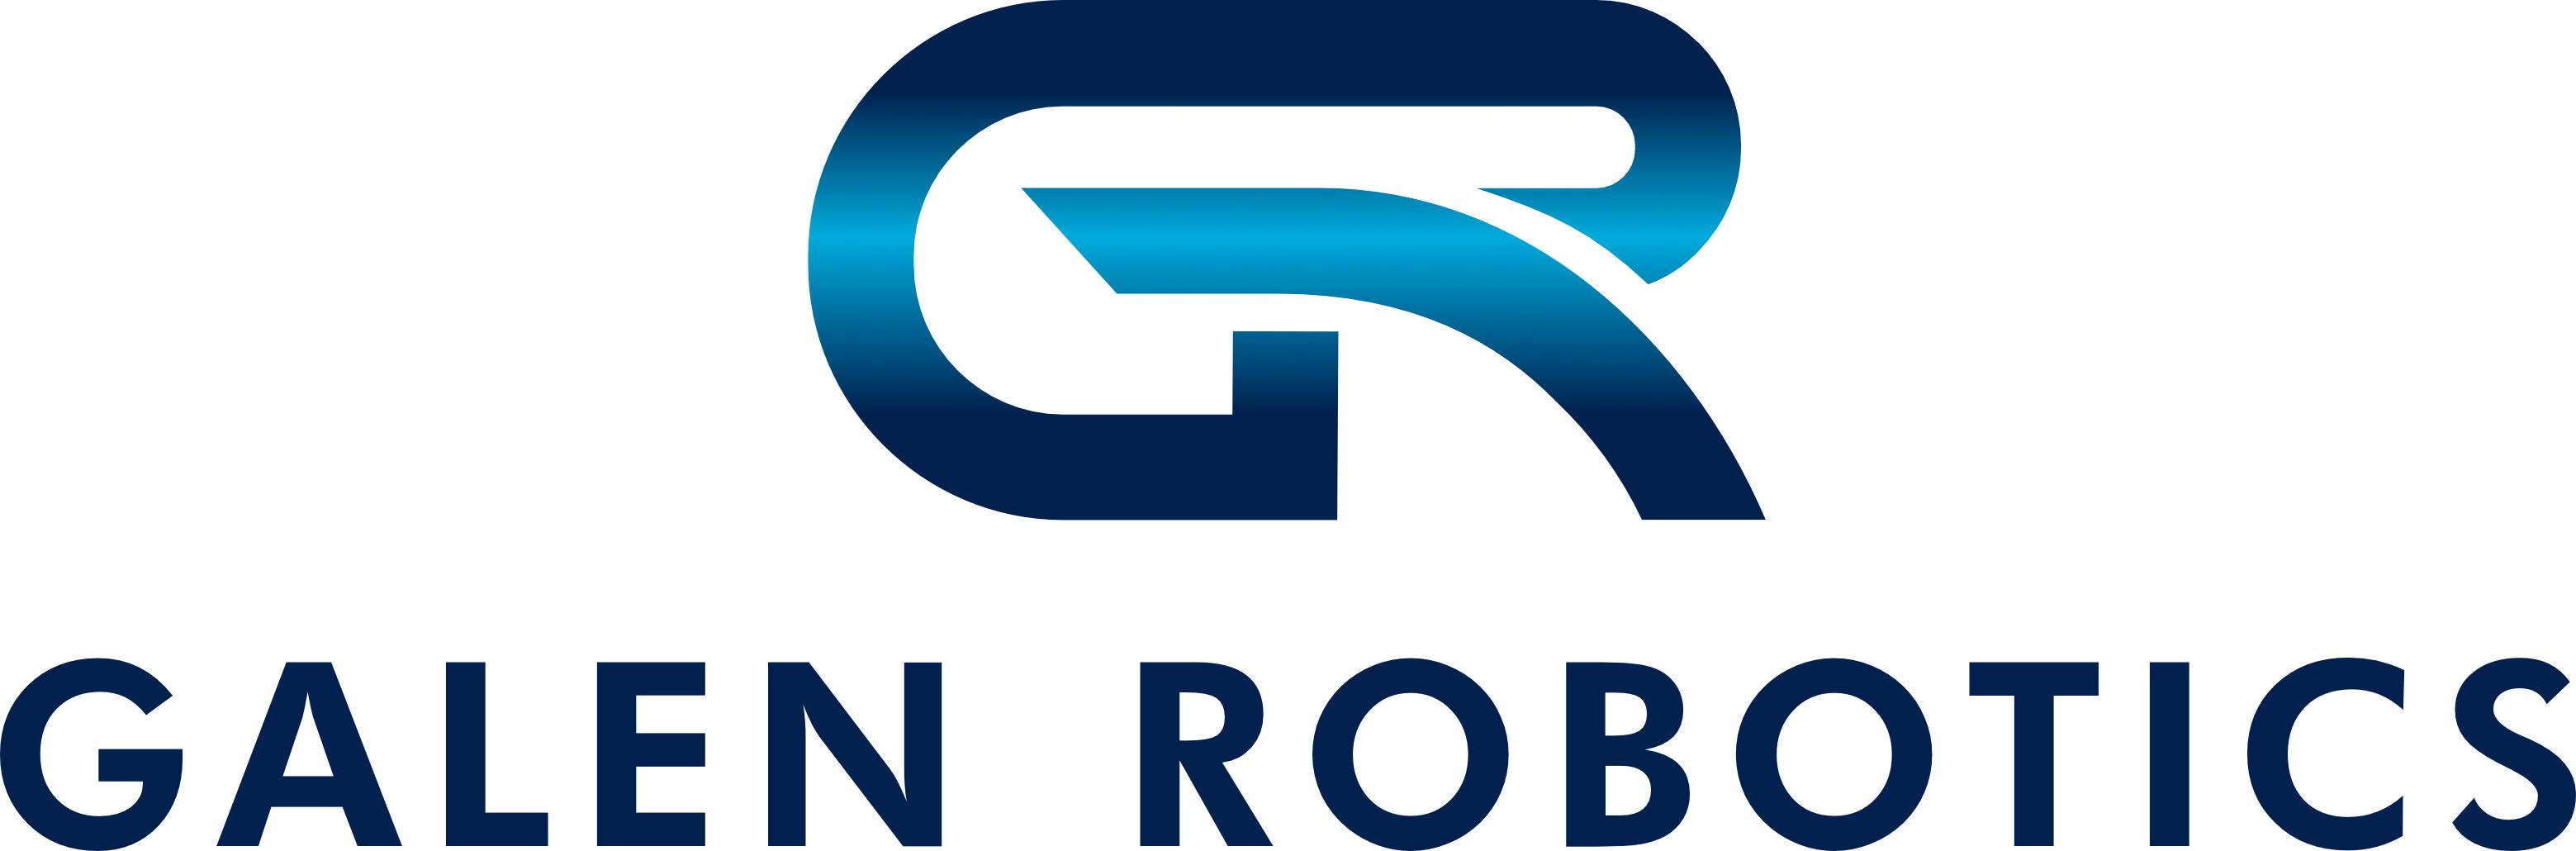 Galen Robotics - Medical surgical robots